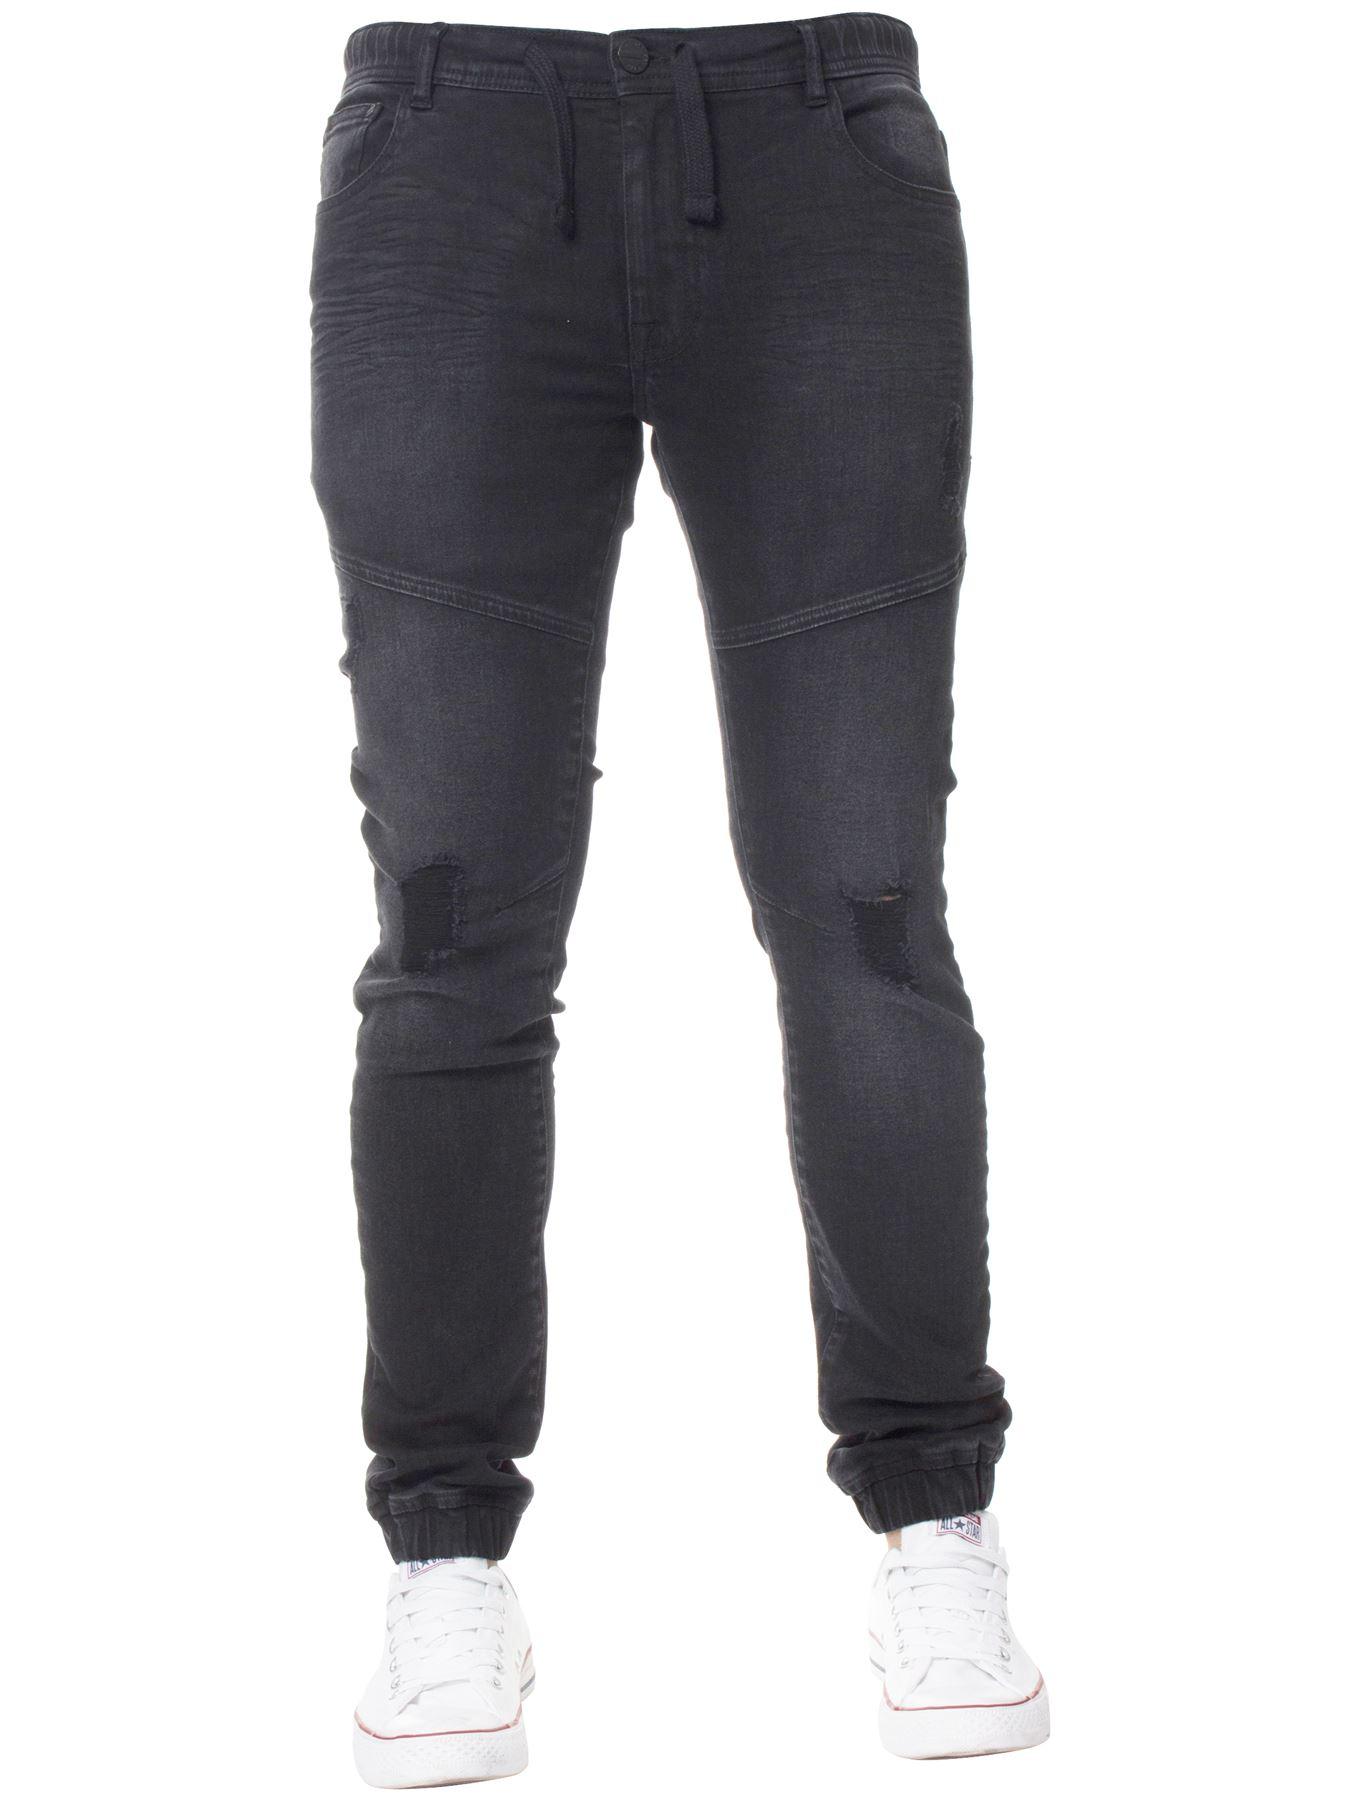 Enzo-Mens-Cuffed-Jeans-Stretch-Fit-Ripped-Denim-Jogger-Pants-Big-Tall-All-Waists thumbnail 5